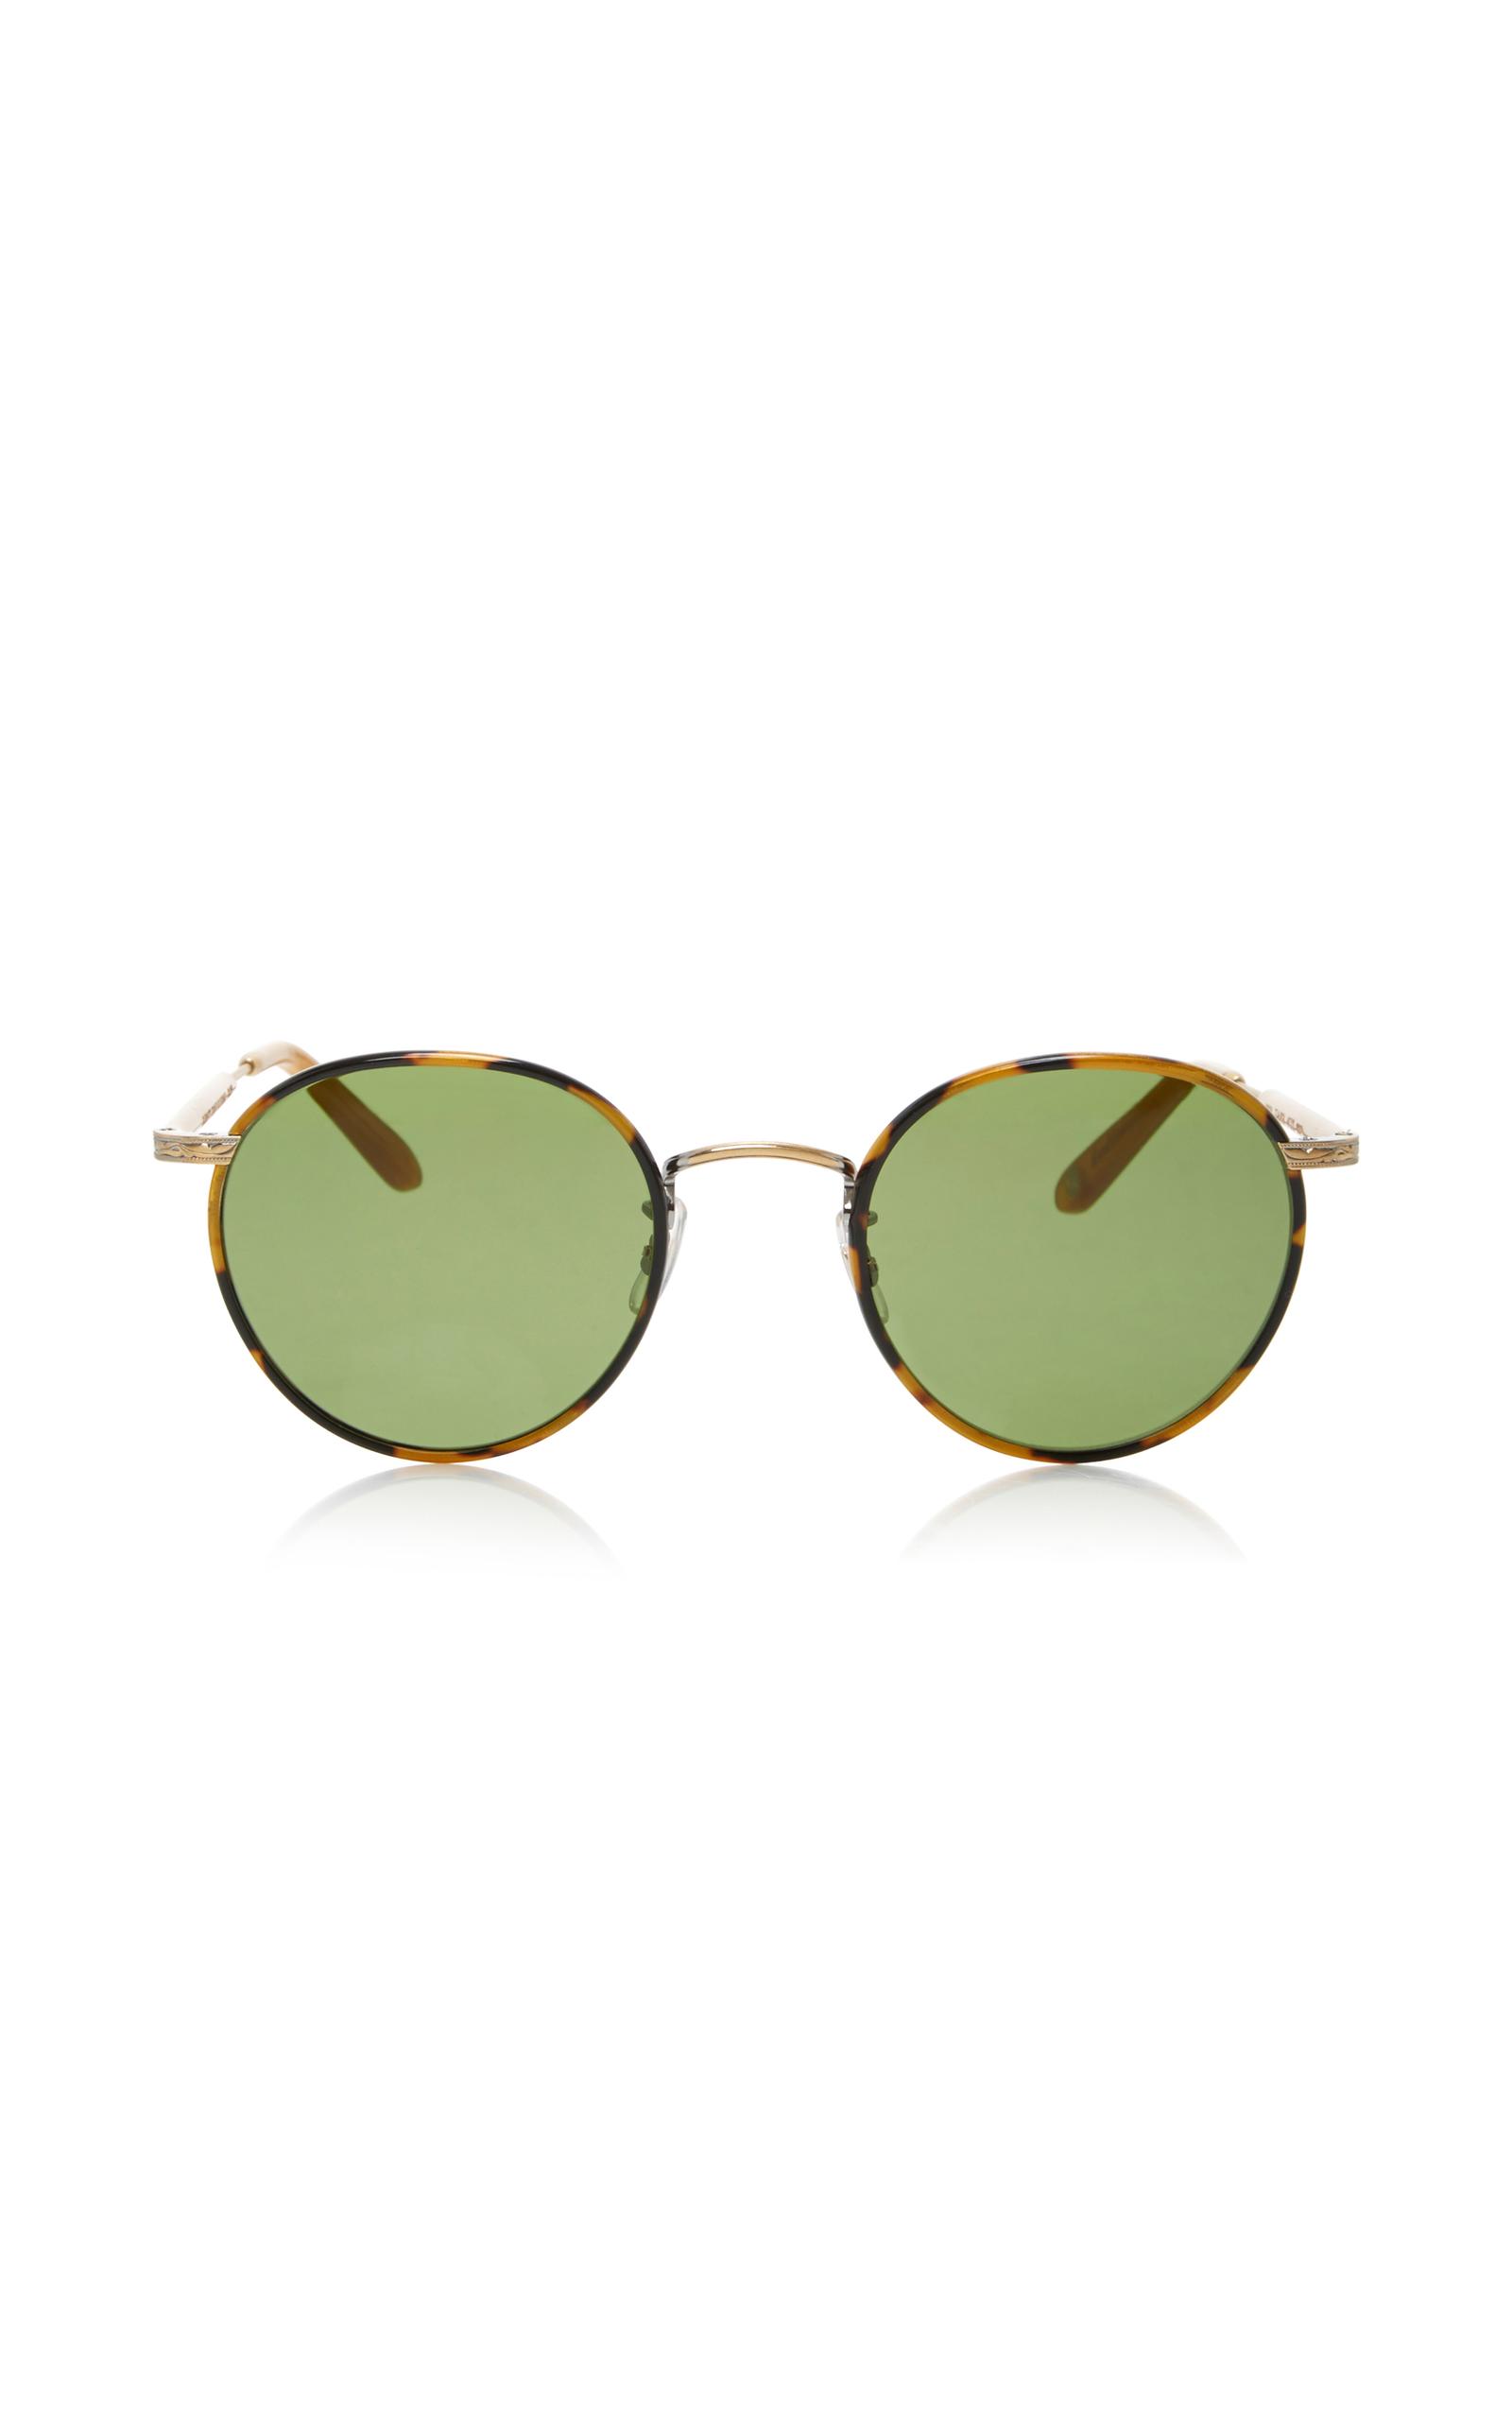 Garrett Leight Sunglasses, $365